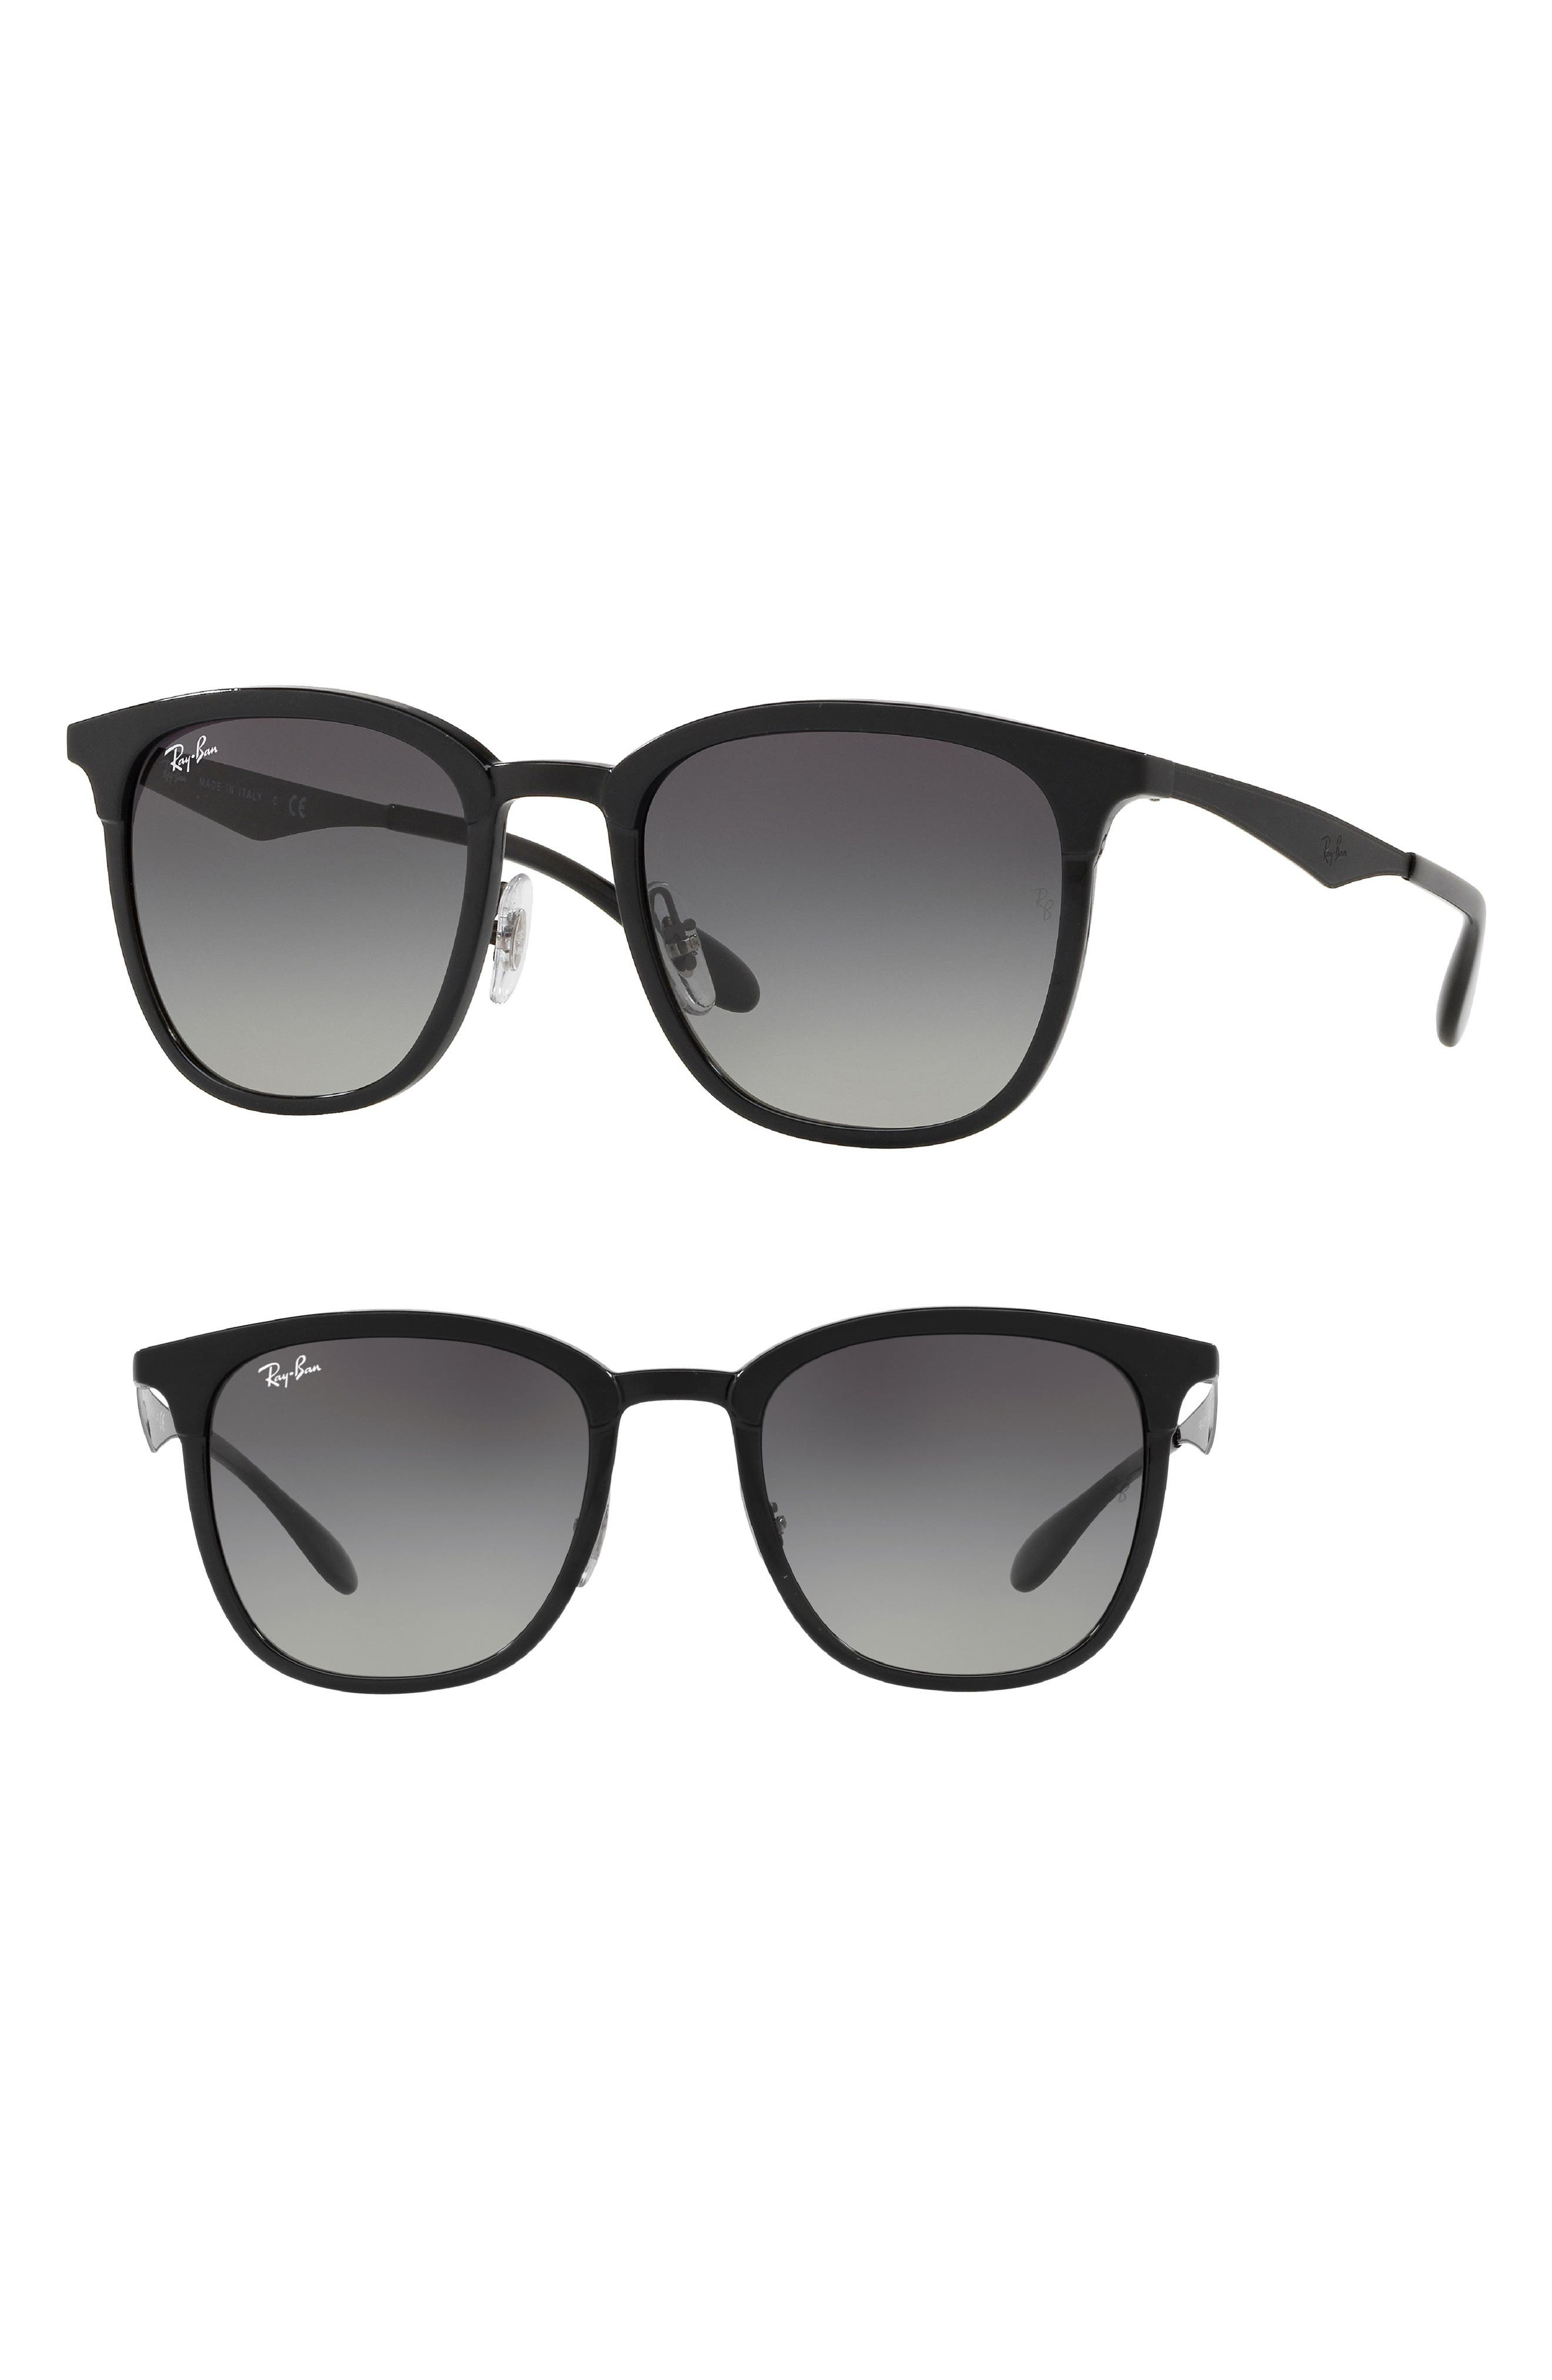 Ray-Ban Highstreet 51Mm Square Sunglasses -